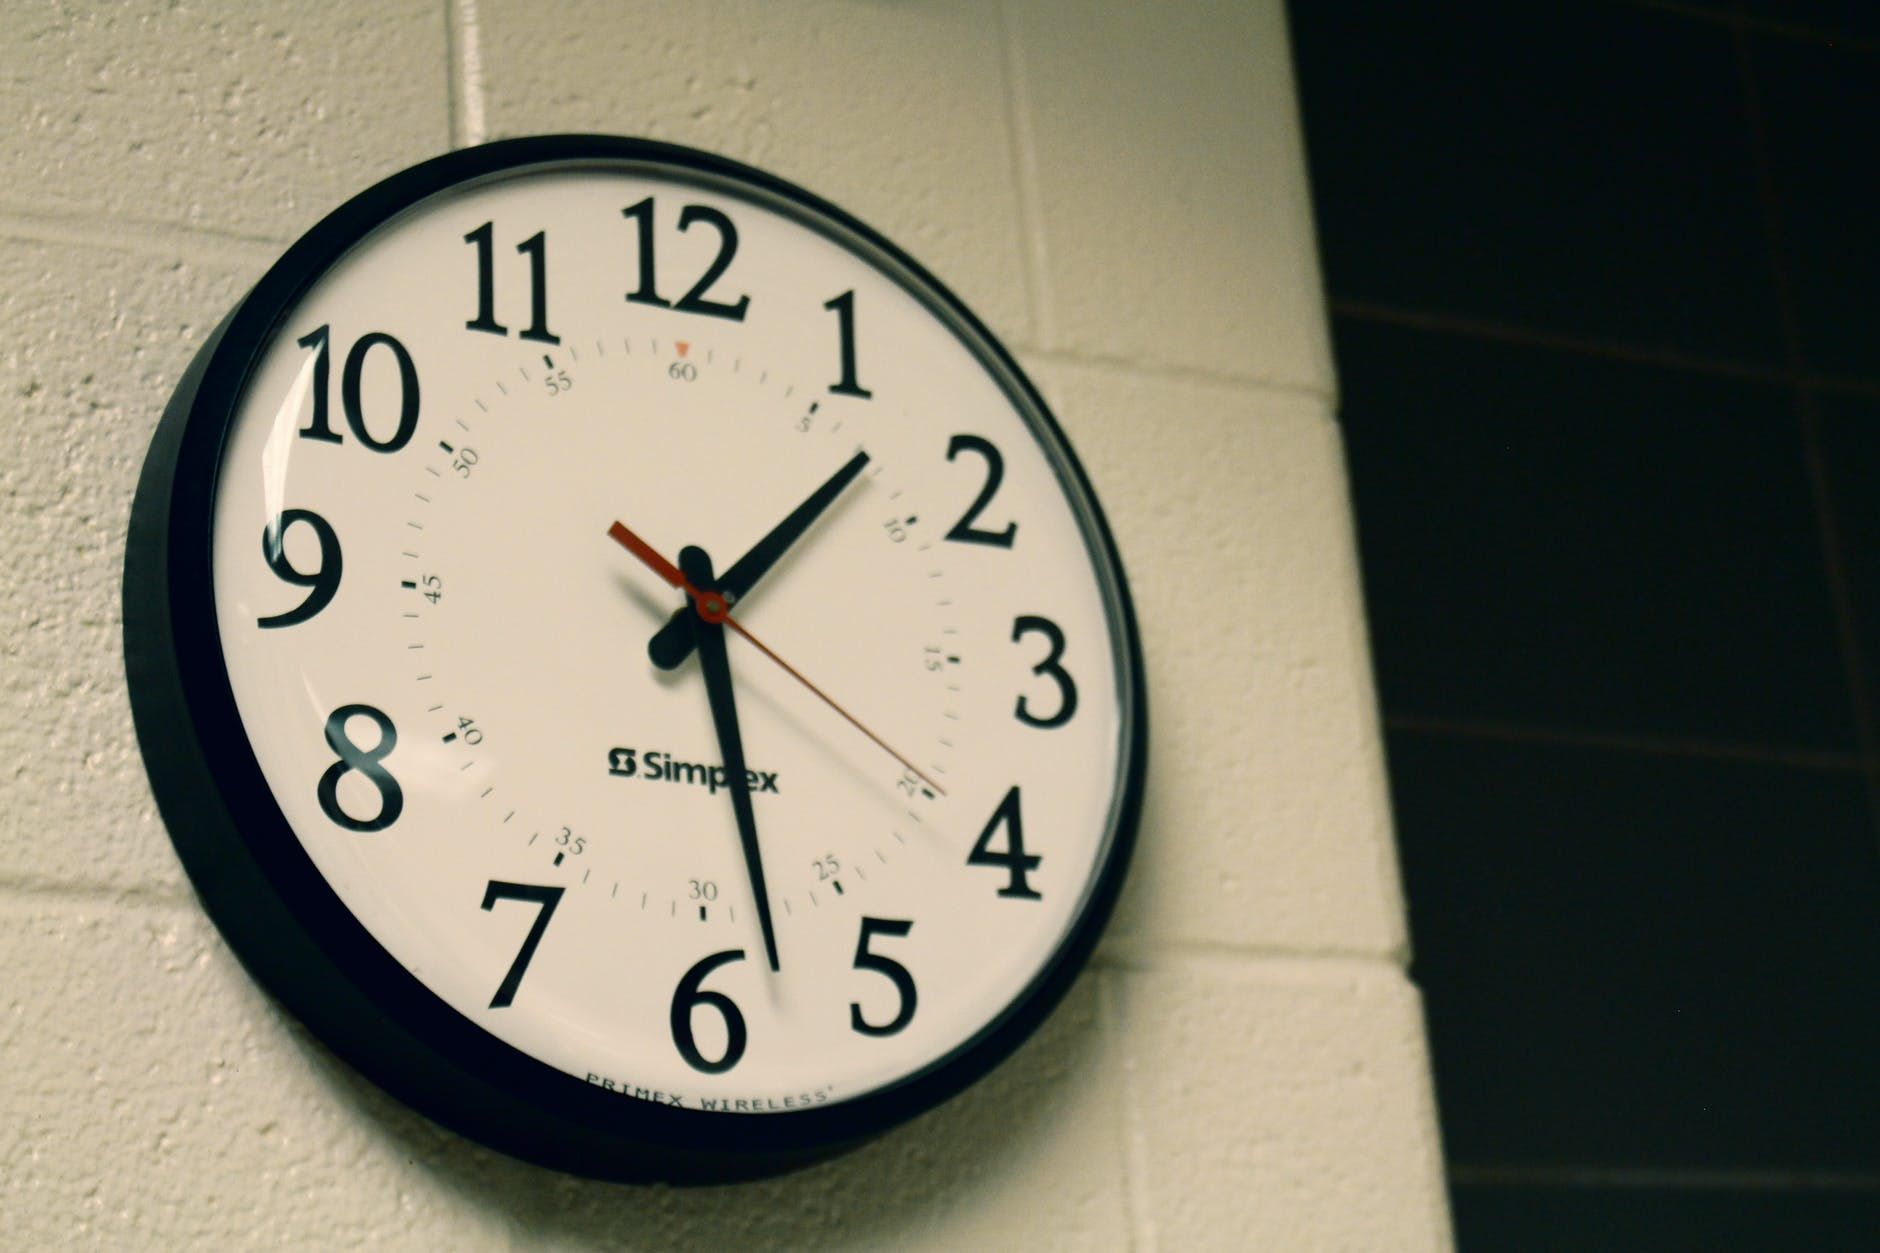 round black analog wall clock